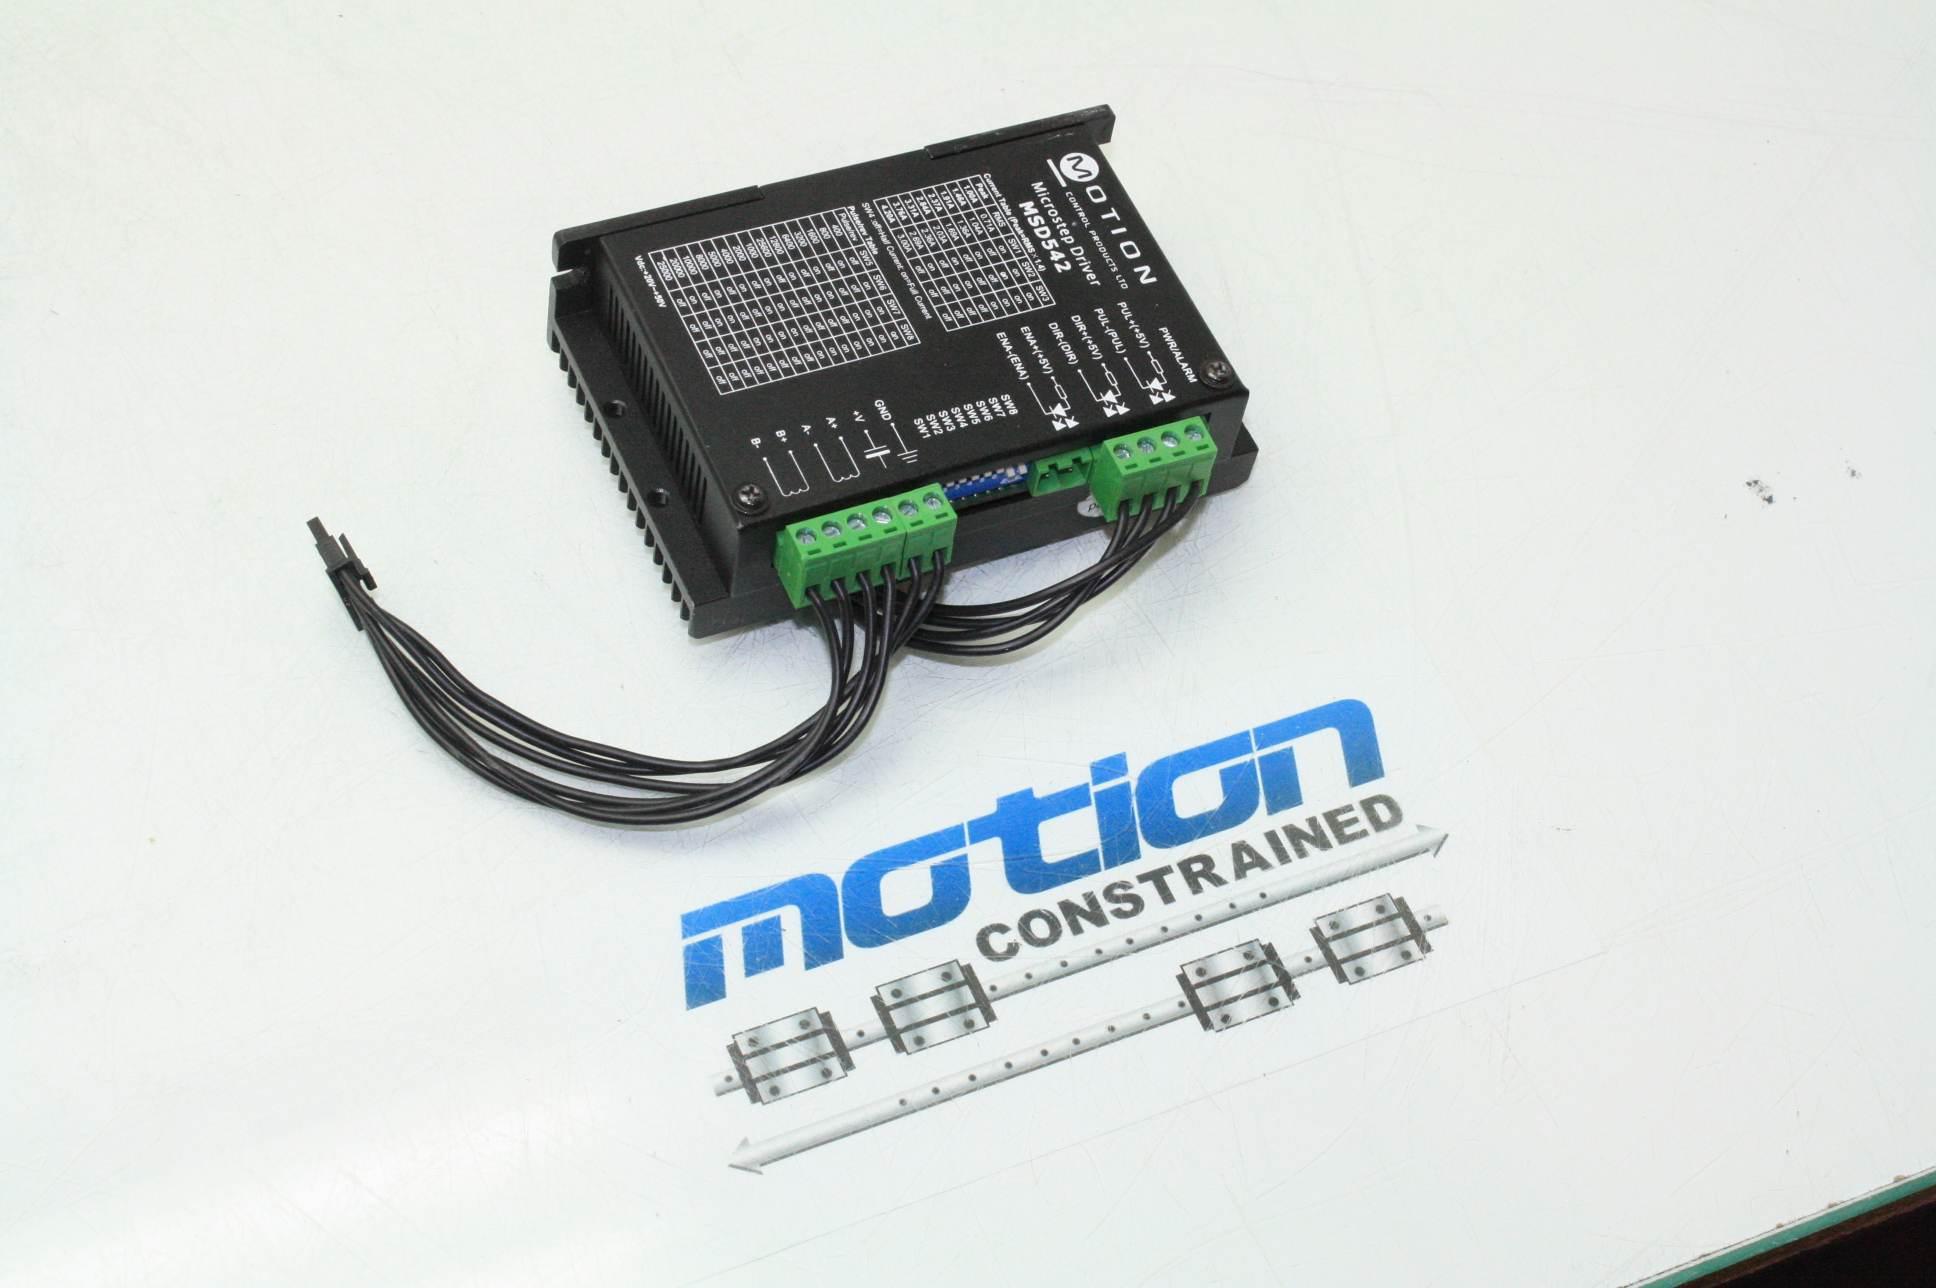 Motion Msd542 V2 0 Microstepping Stepper Motor Drive 2